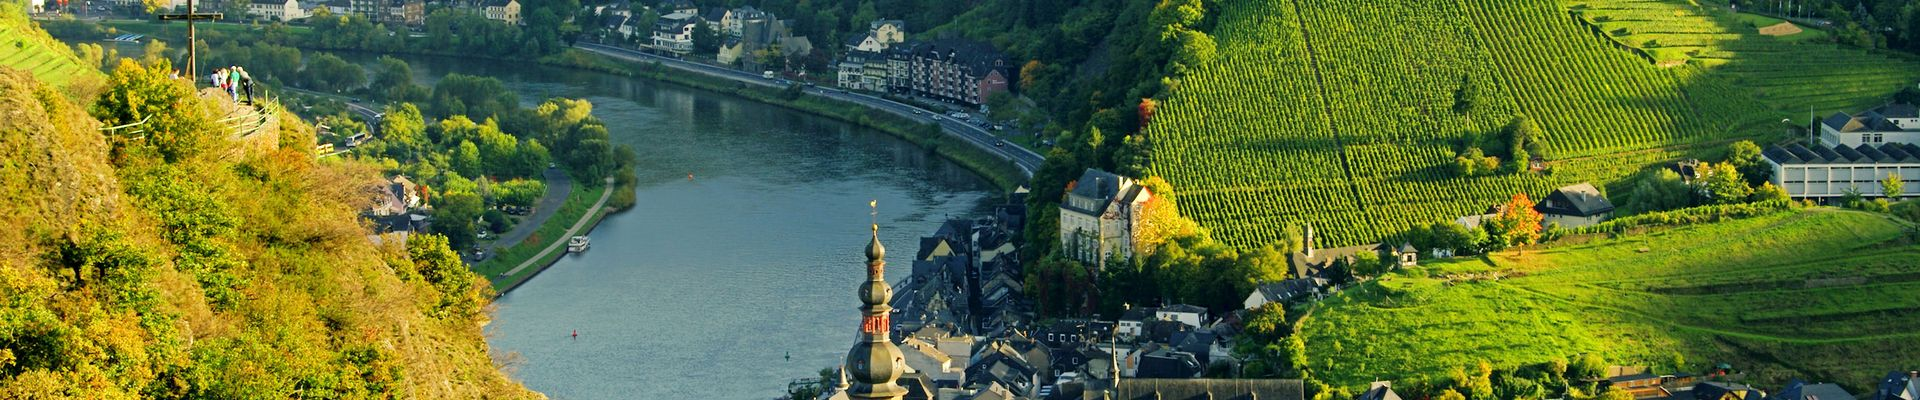 Wellnesshotels in Rheinland-Pfalz